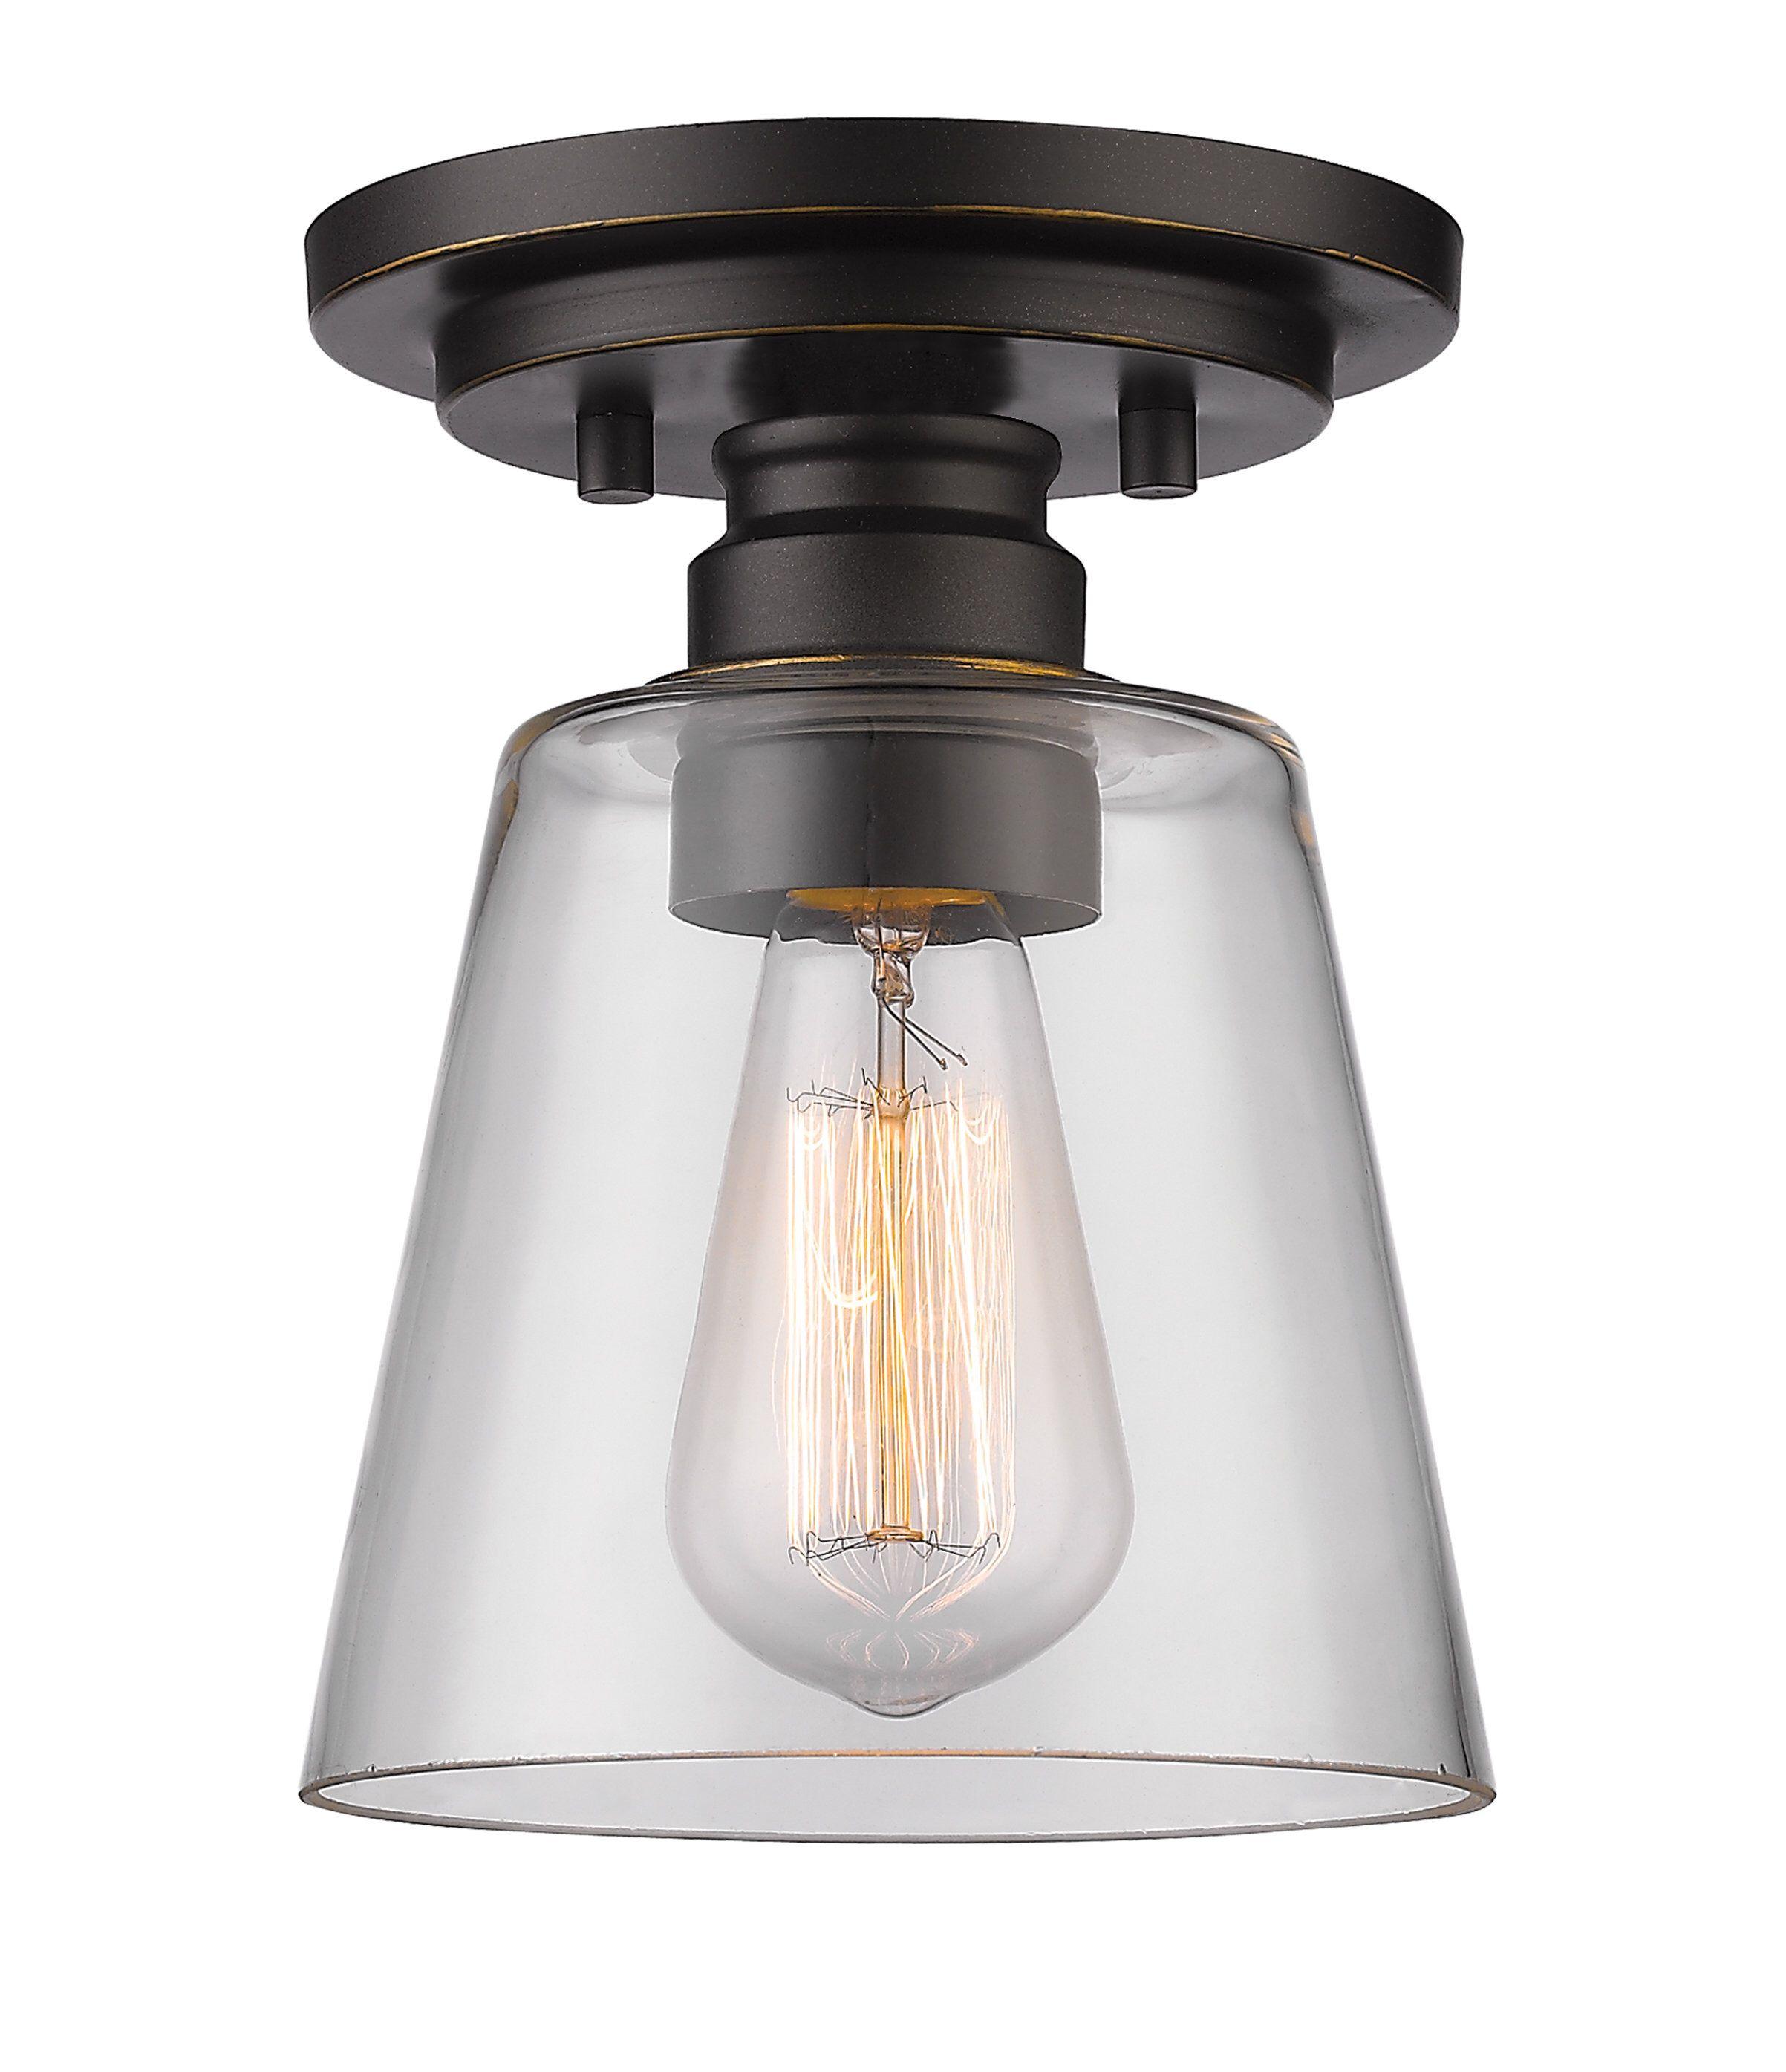 Clayton 1 Light Semi Flush Mount | House Ideas | Flush Mount With Regard To Erico 1 Light Single Bell Pendants (View 15 of 30)